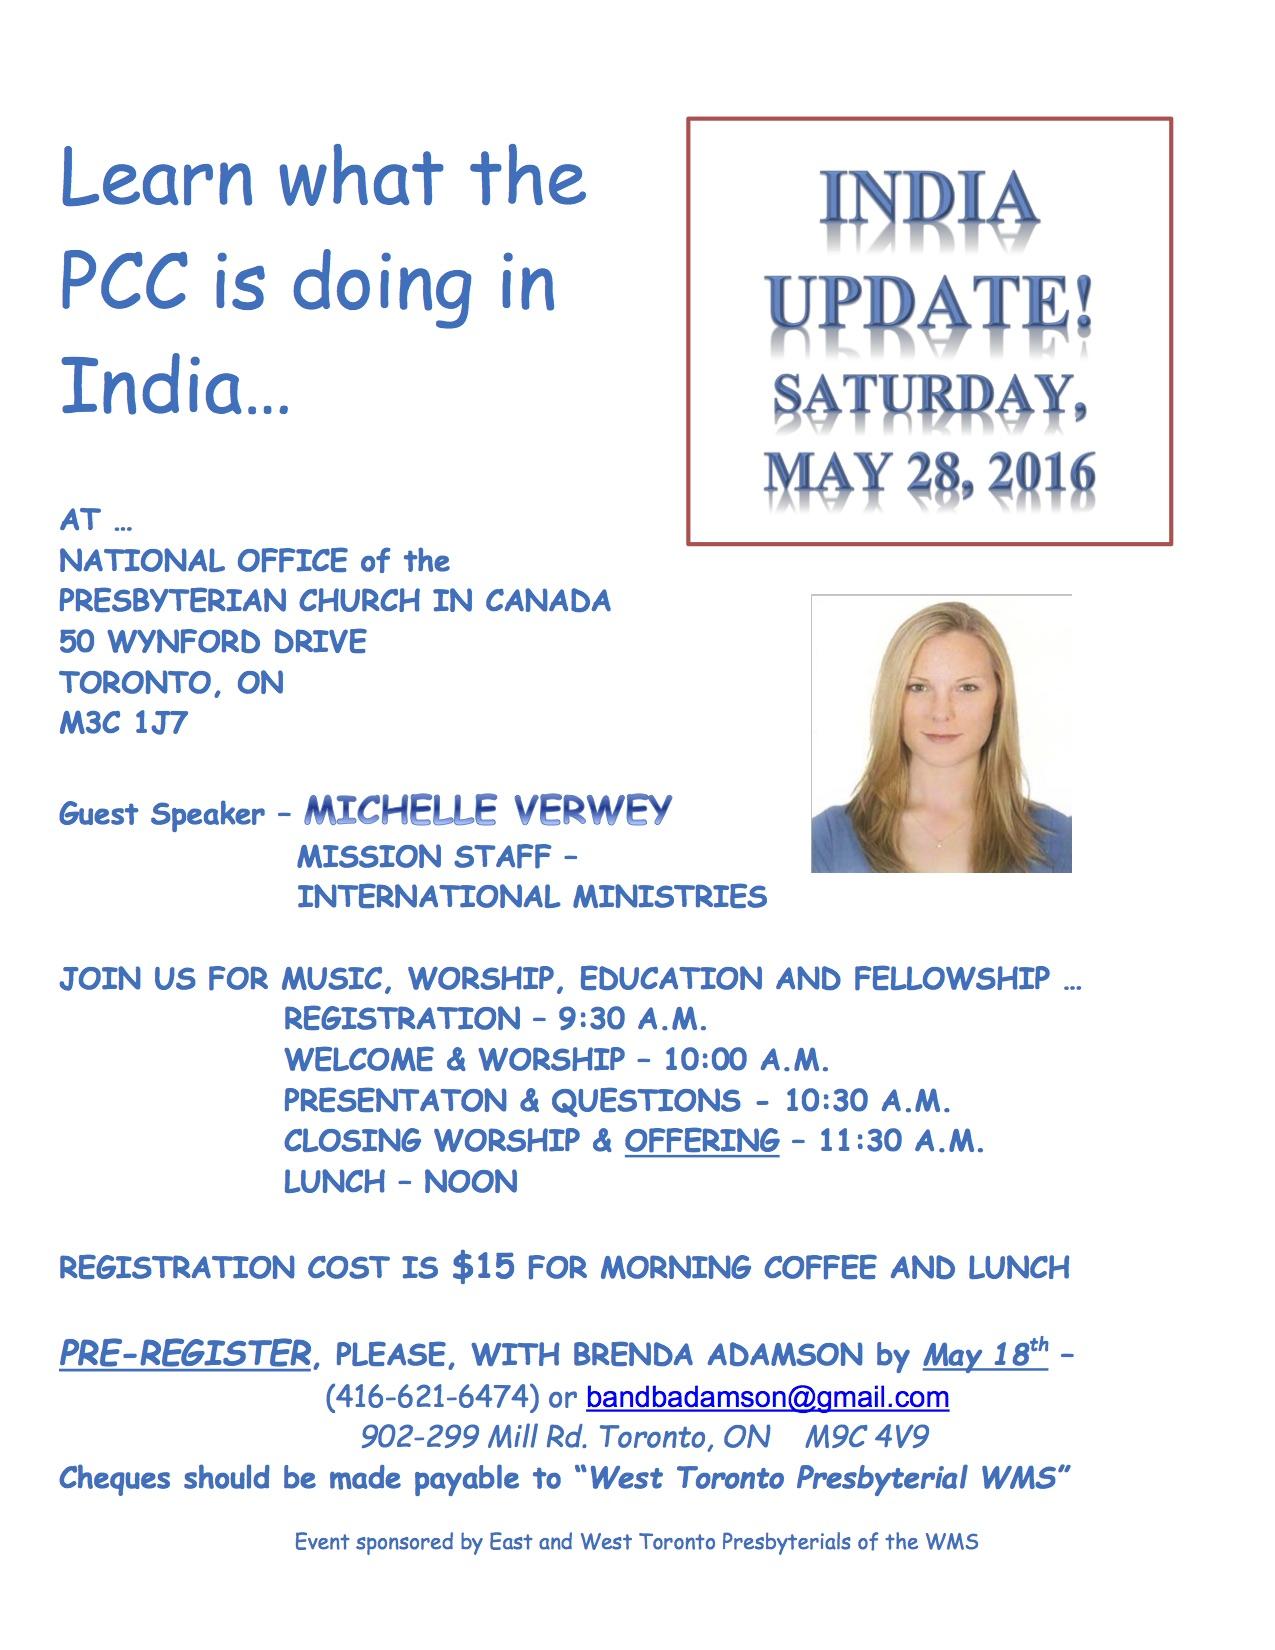 India Update - flyer - 2